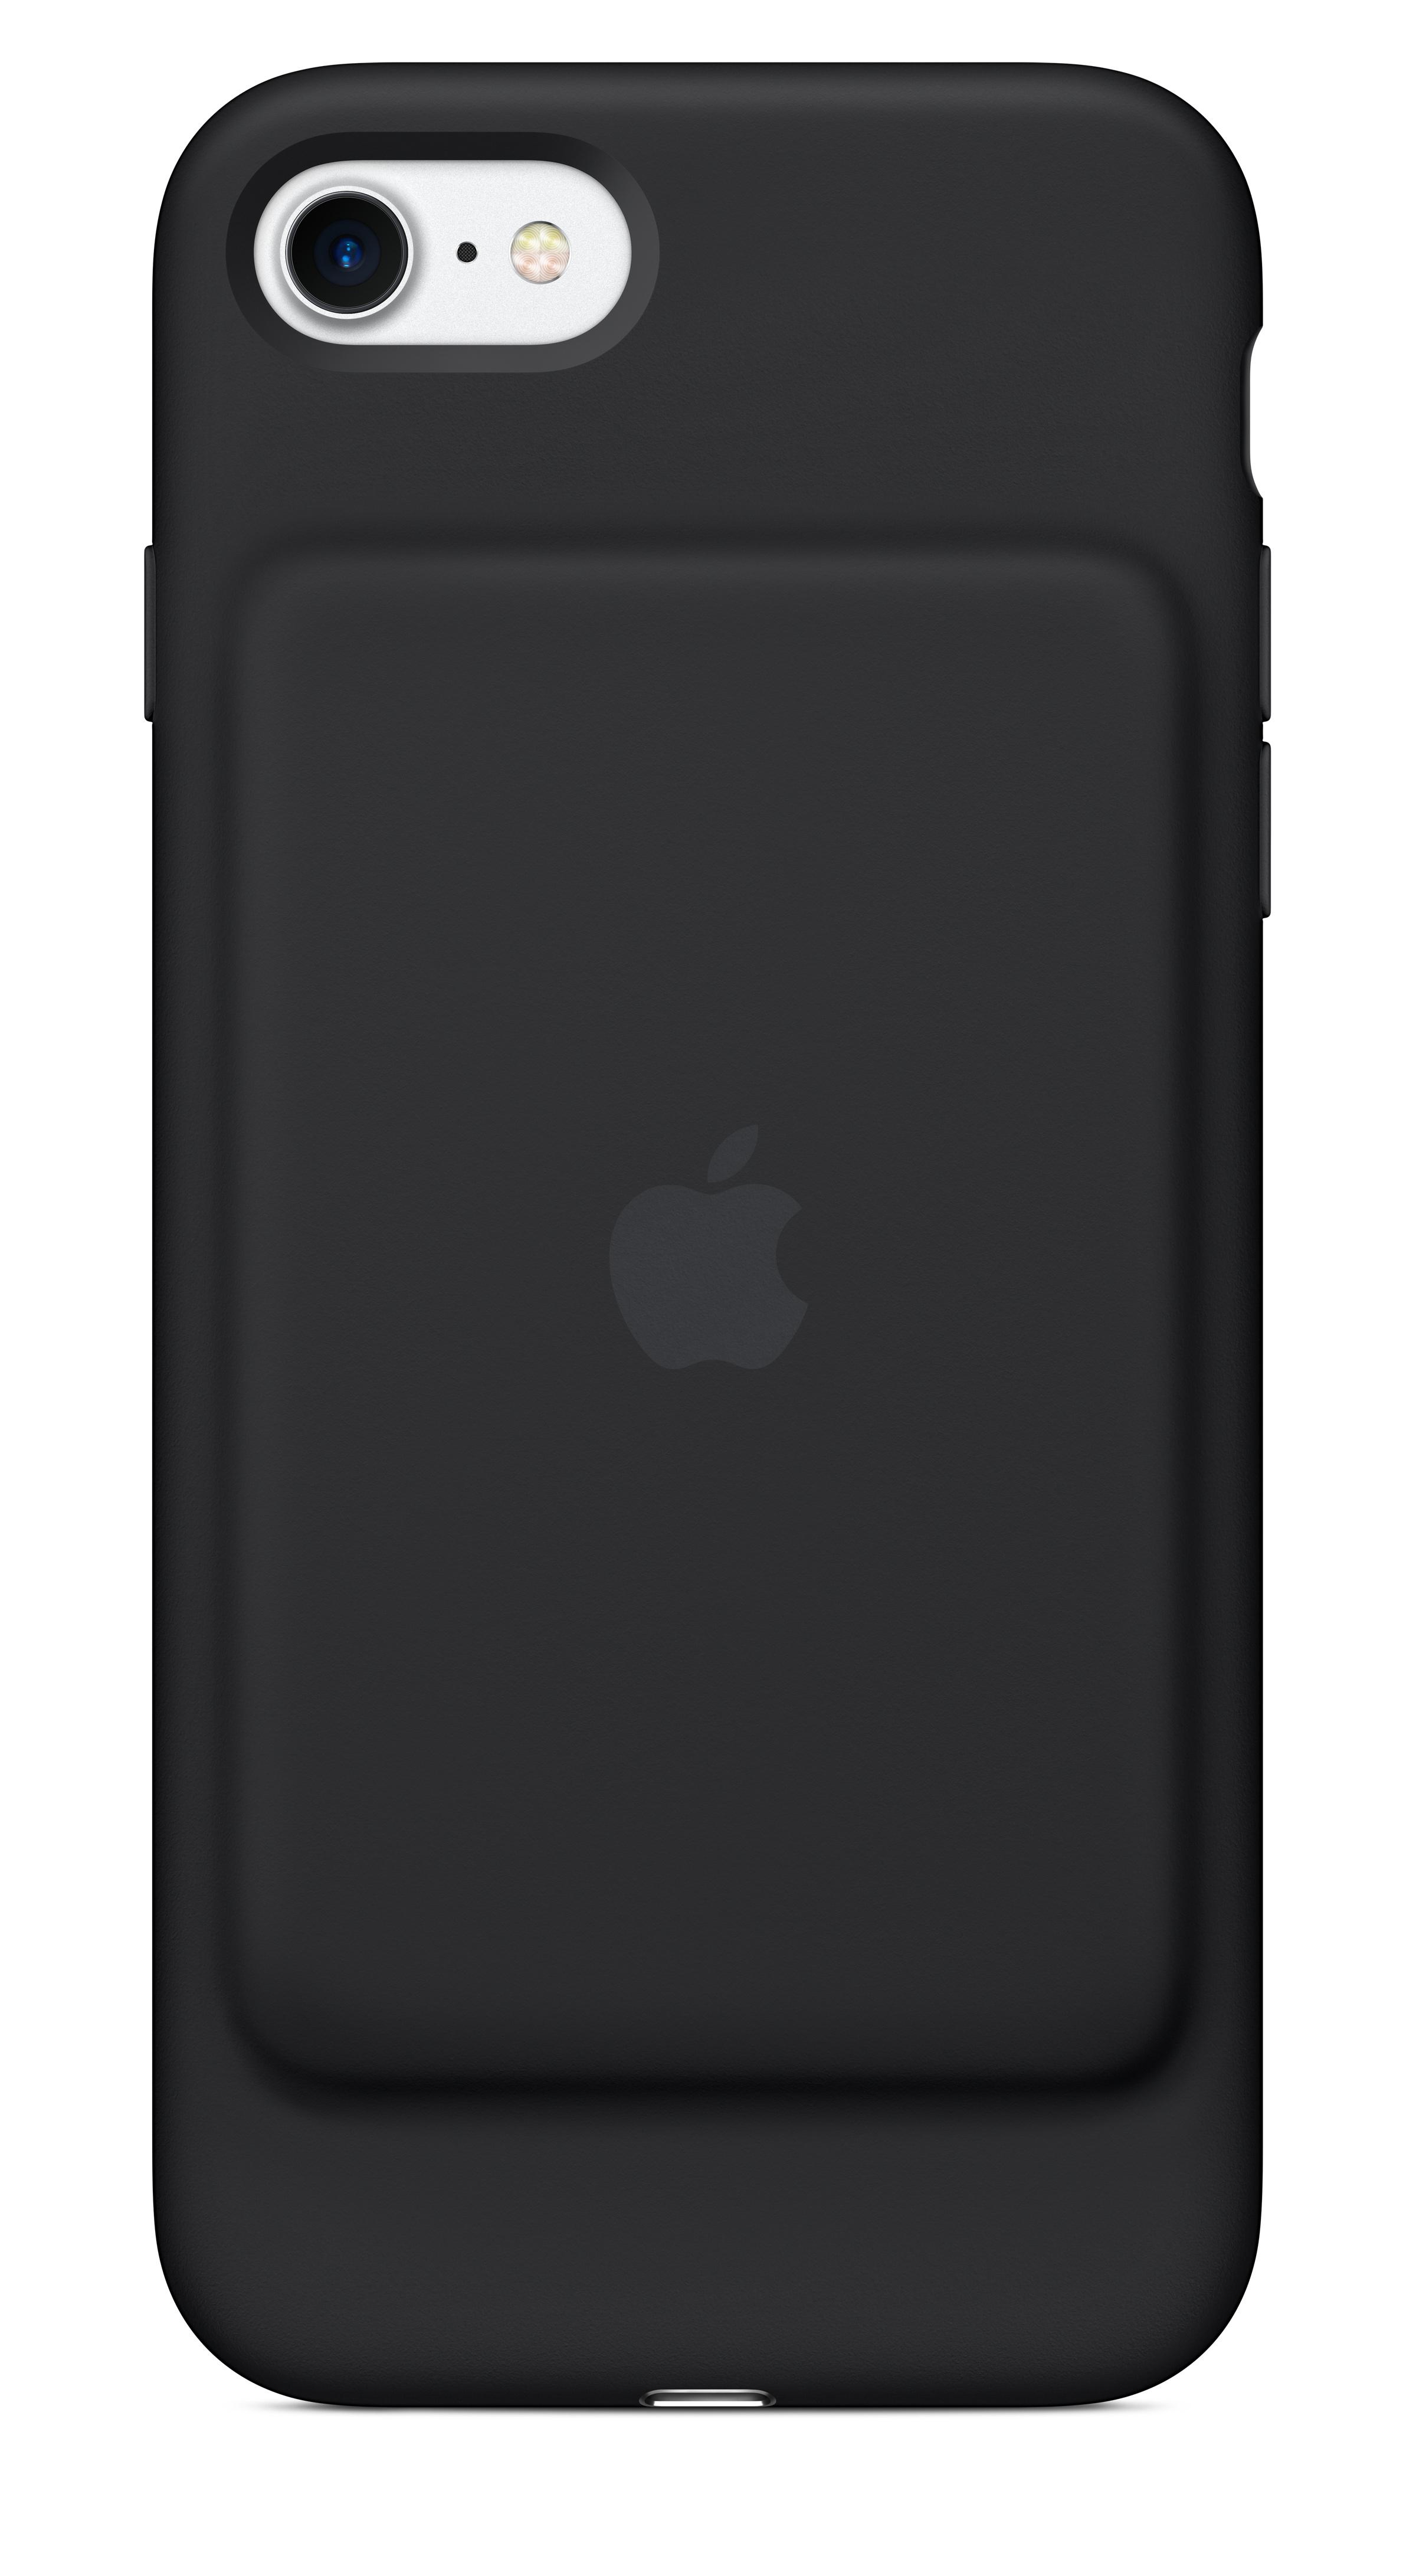 Iphone 7 Smart Battery Case Black Apple Uk